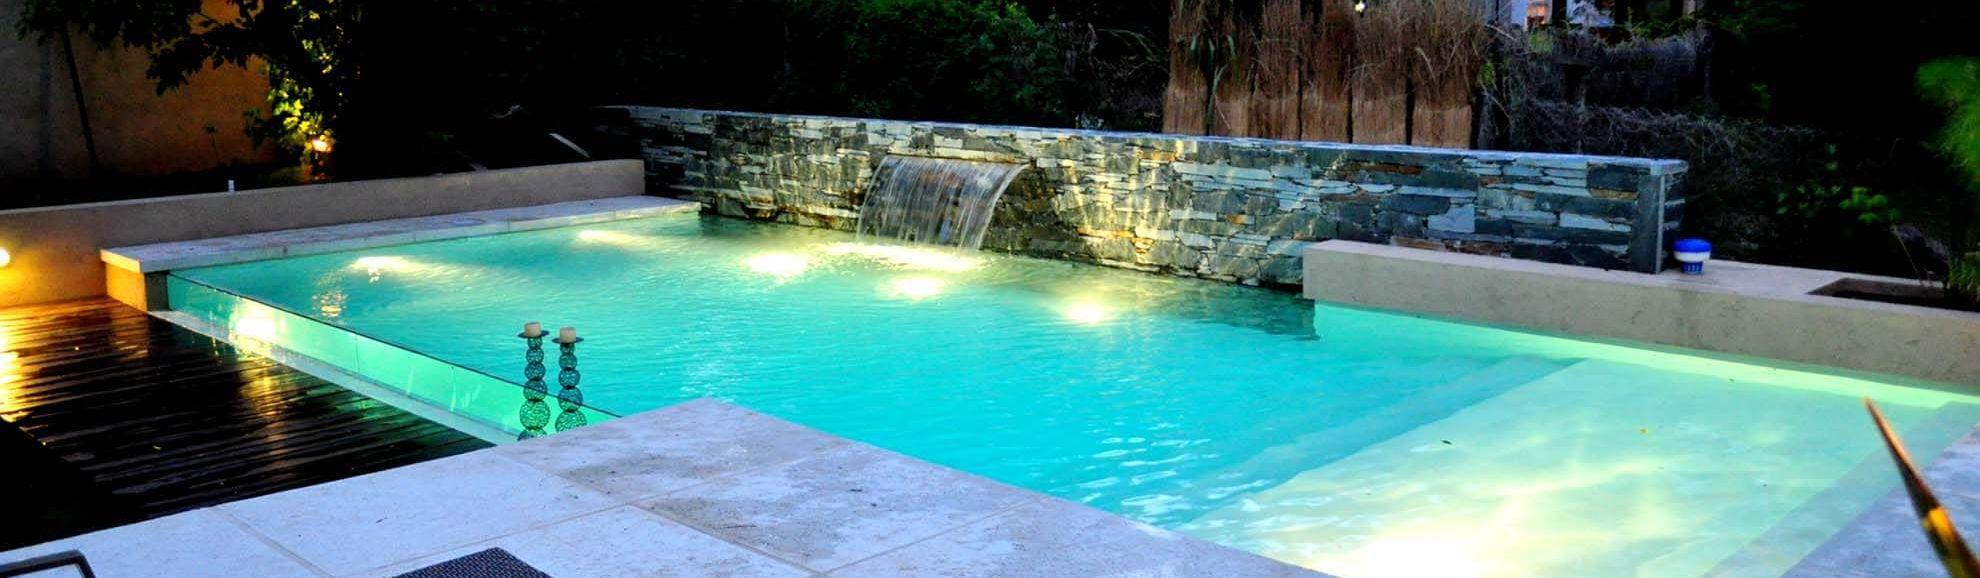 Piscinas familiares de piscinas scualo homify for Fotos de piscinas climatizadas